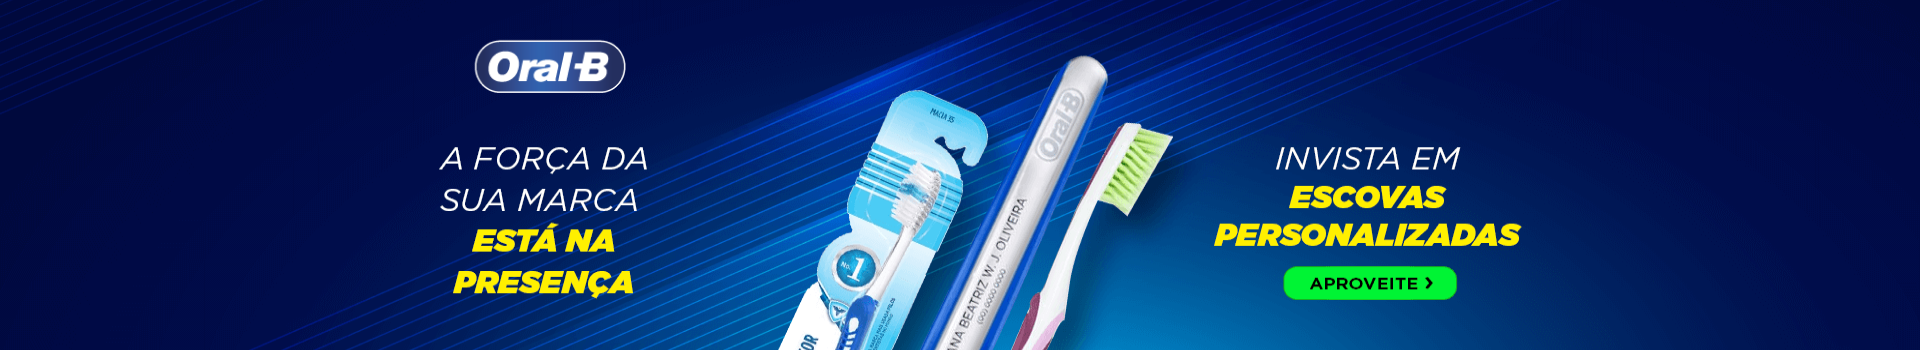 Escova de dente personalizada